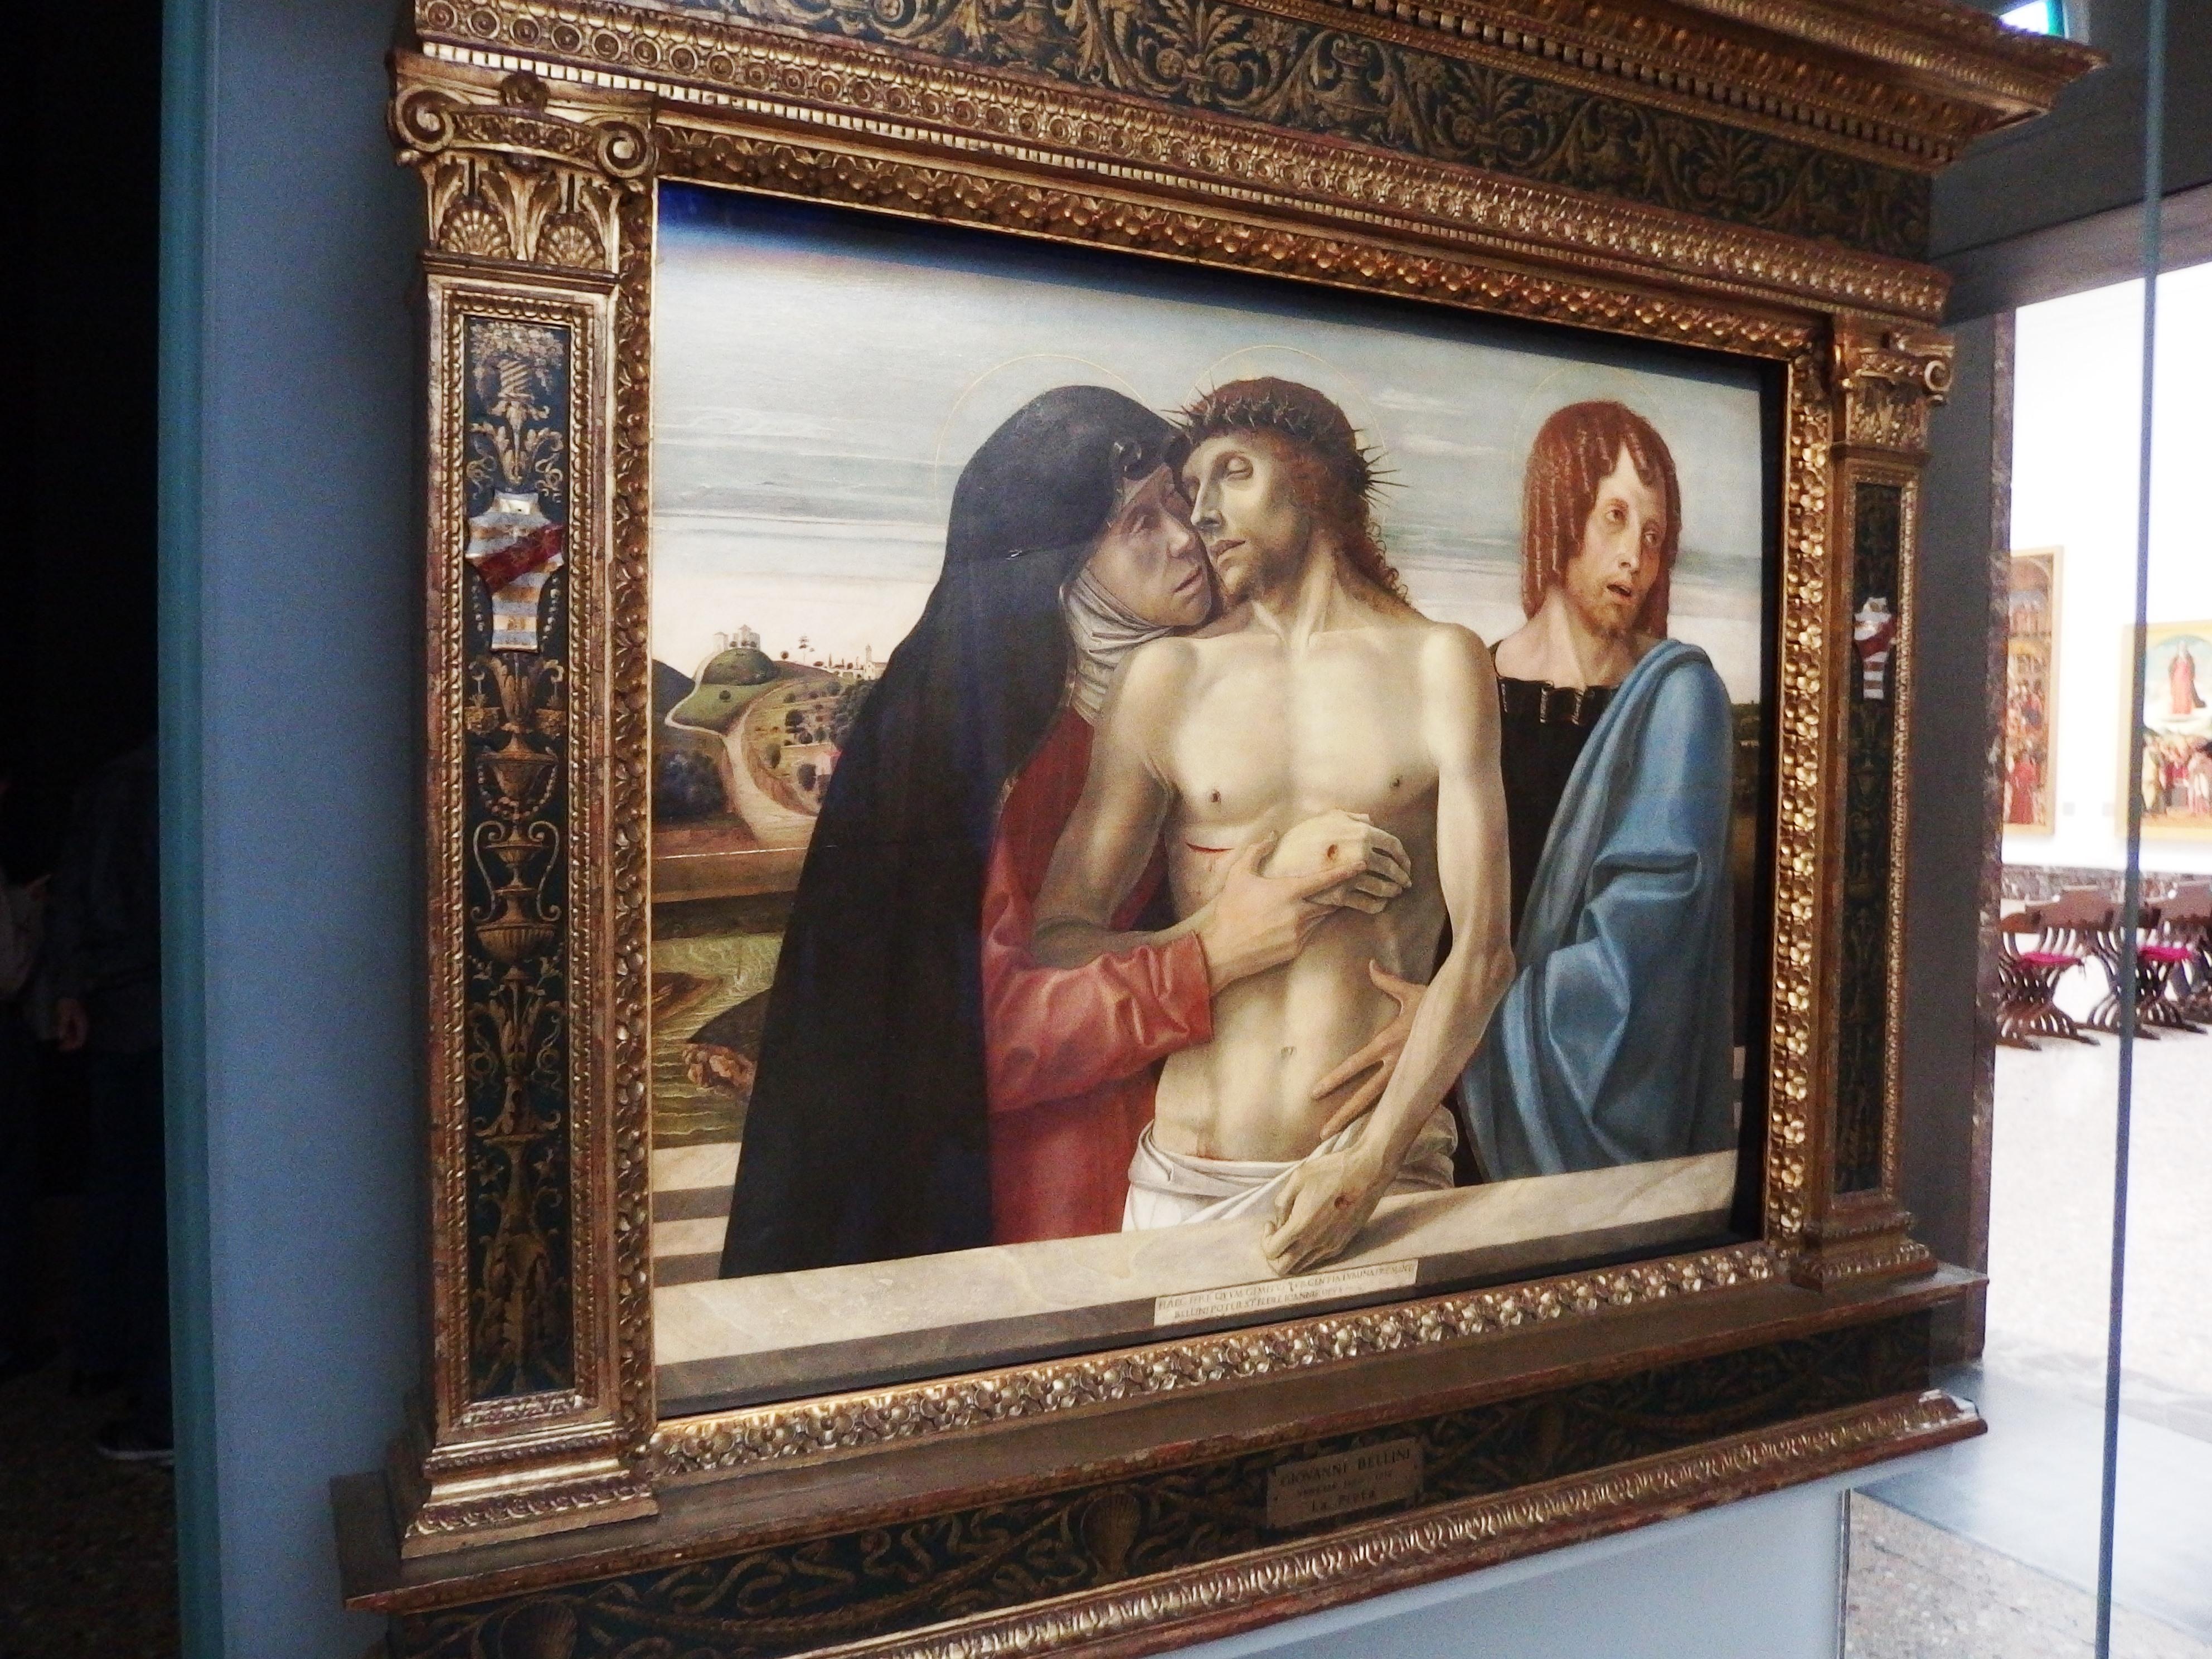 Itálie - Milán - Pinacoteca di Brera, G.Belini, Pieta, 1470